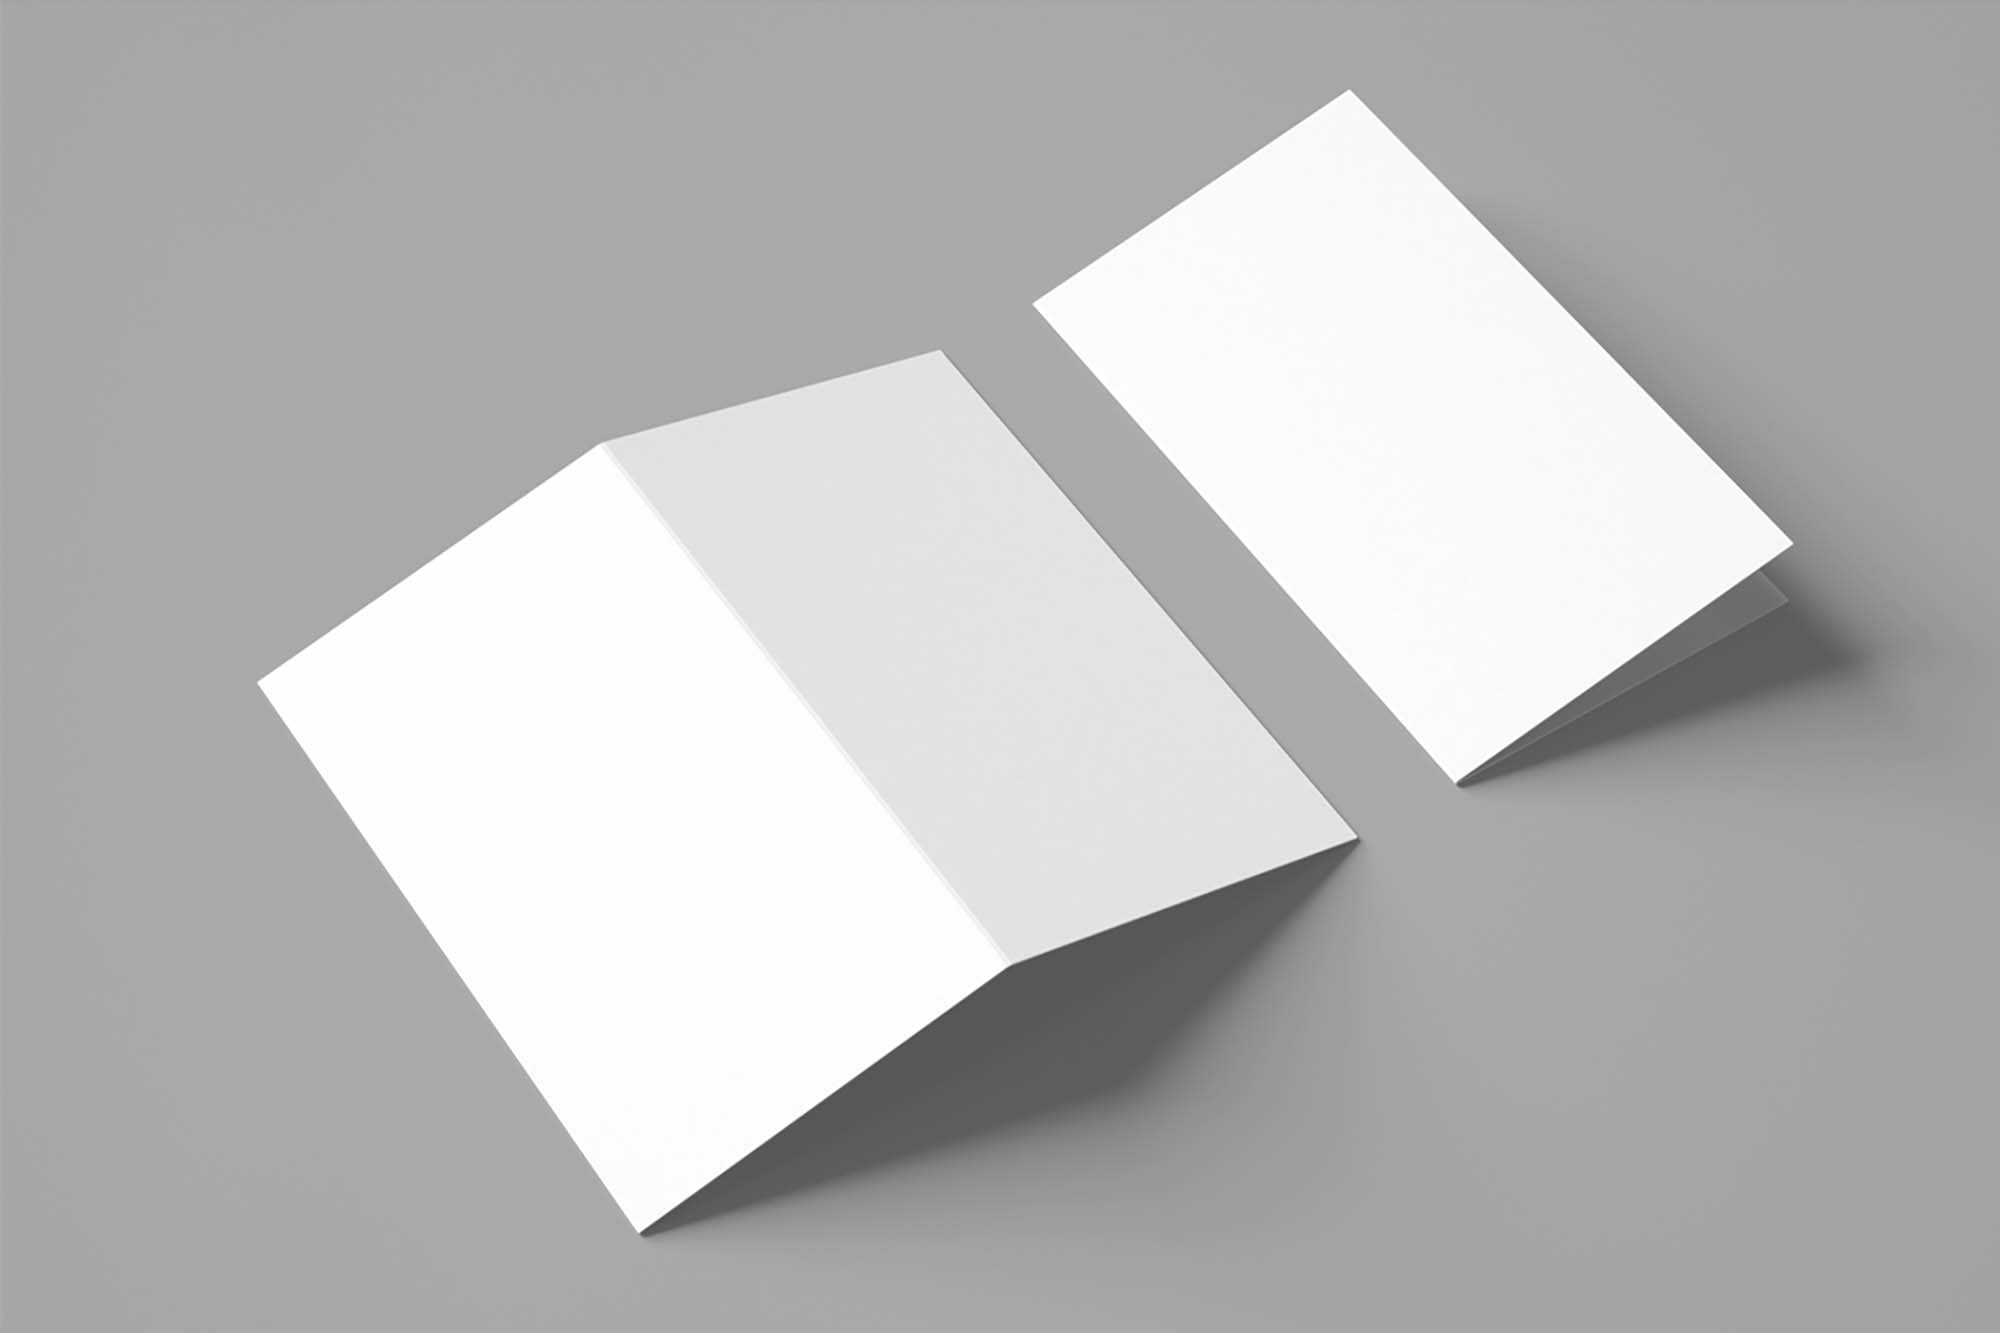 2-Fold Brochure Mockup 2